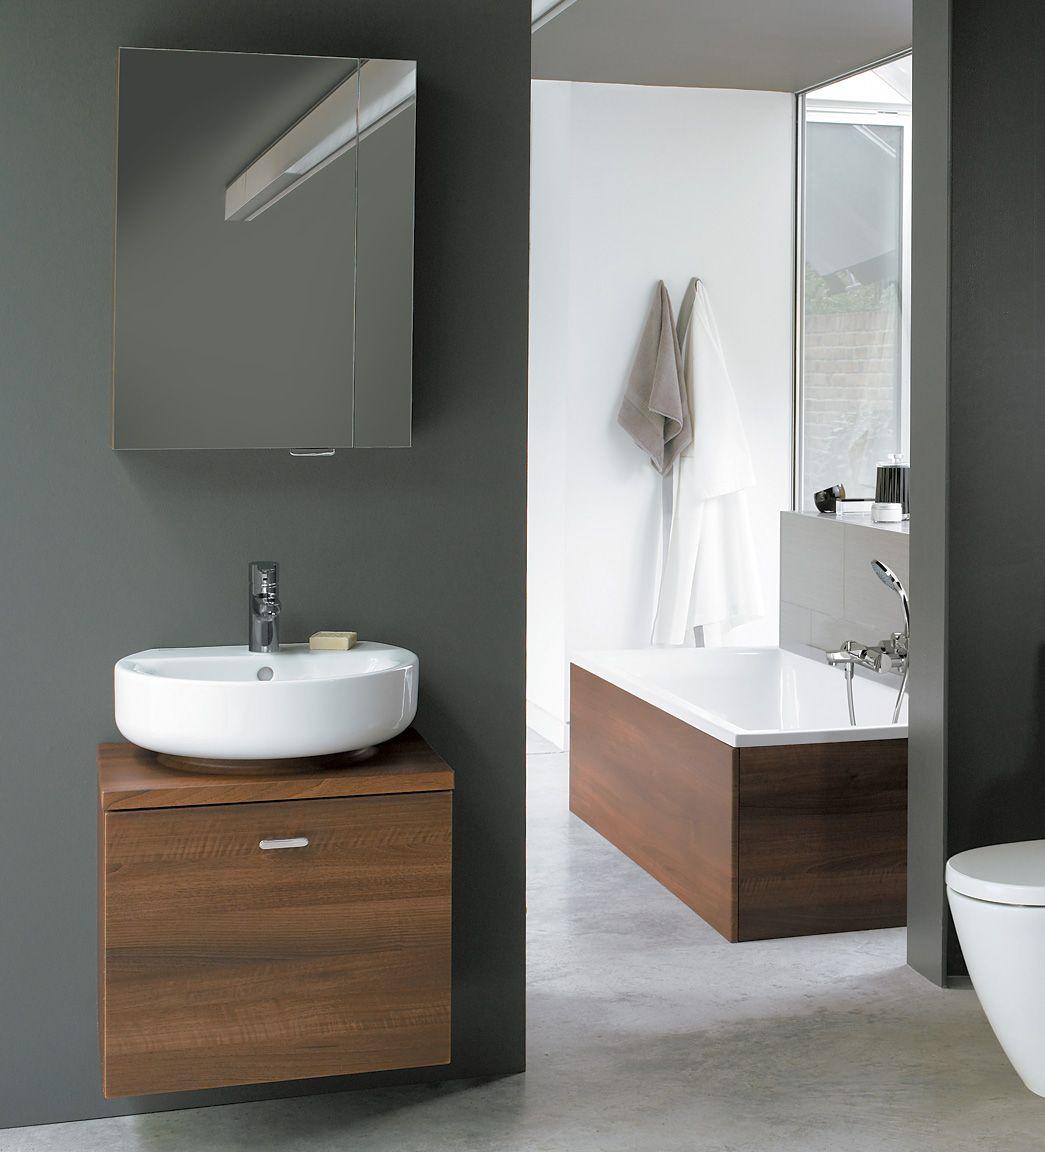 Bathroom Cabinets 55cm ideal standard concept sphere-arc wall hung basin unit 55cm-walnut